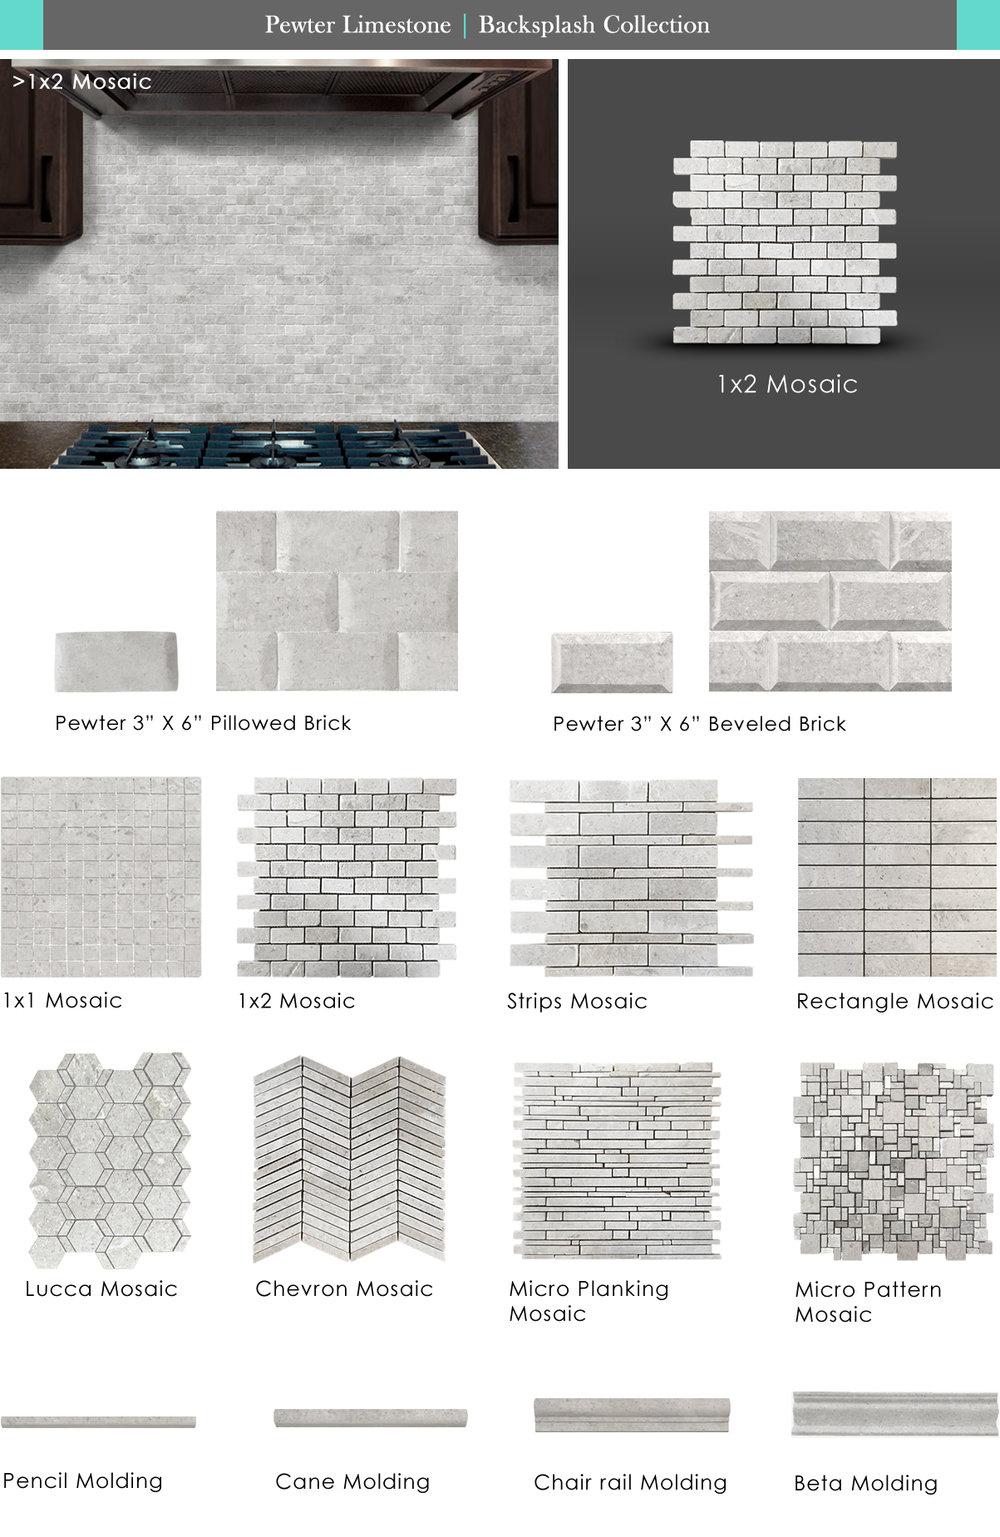 Pewter Limestone BC.jpg